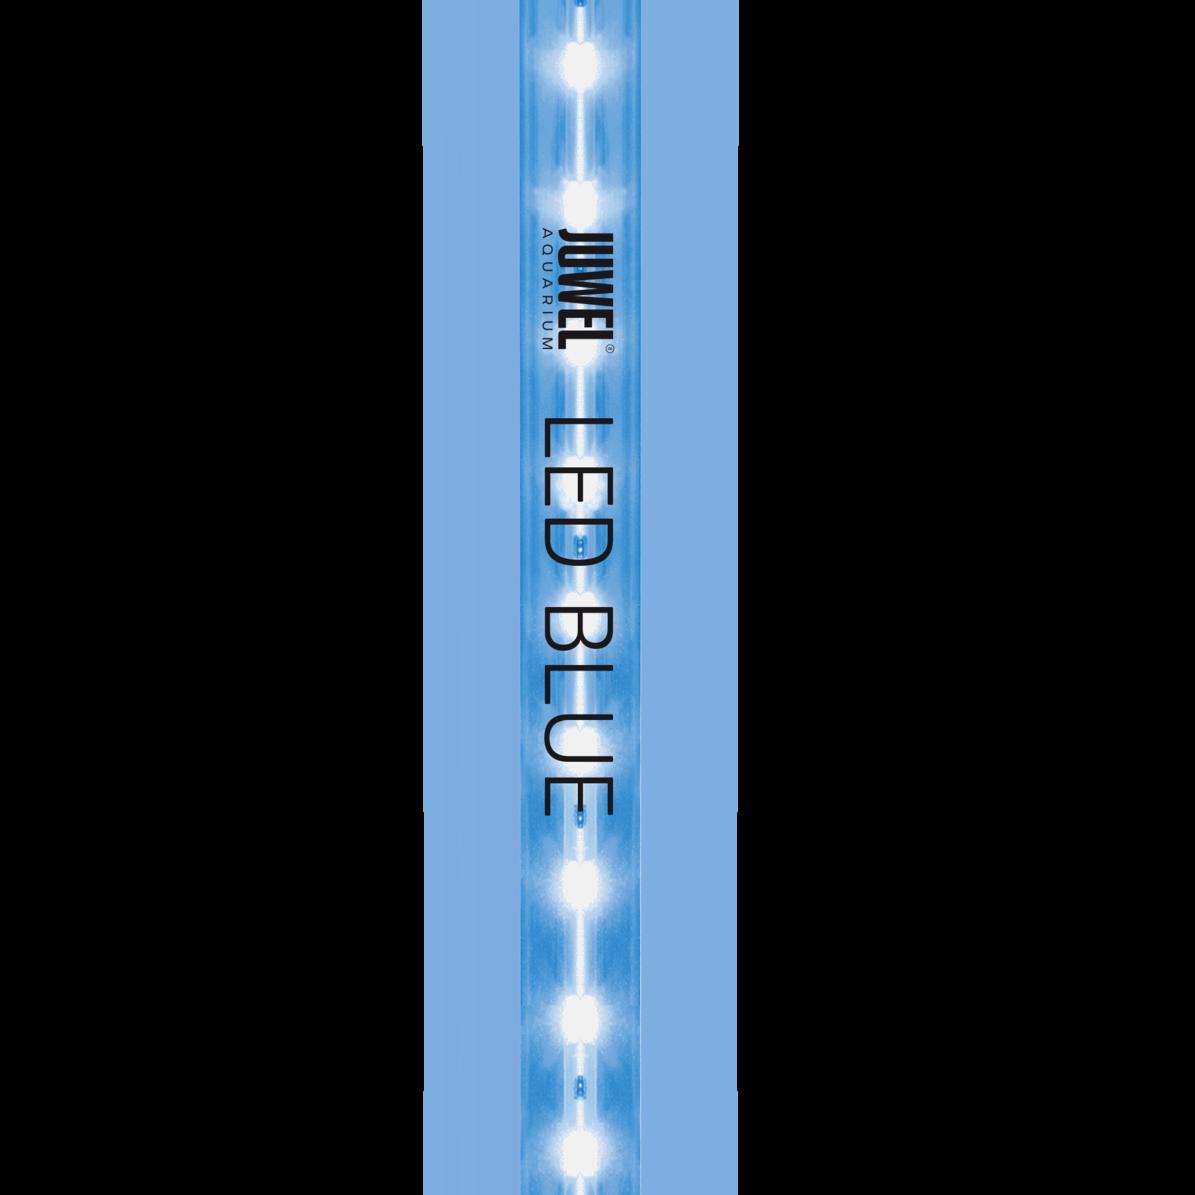 Juwel LED Blau 1200mm 31W Leuchtmedium für Multilux LED